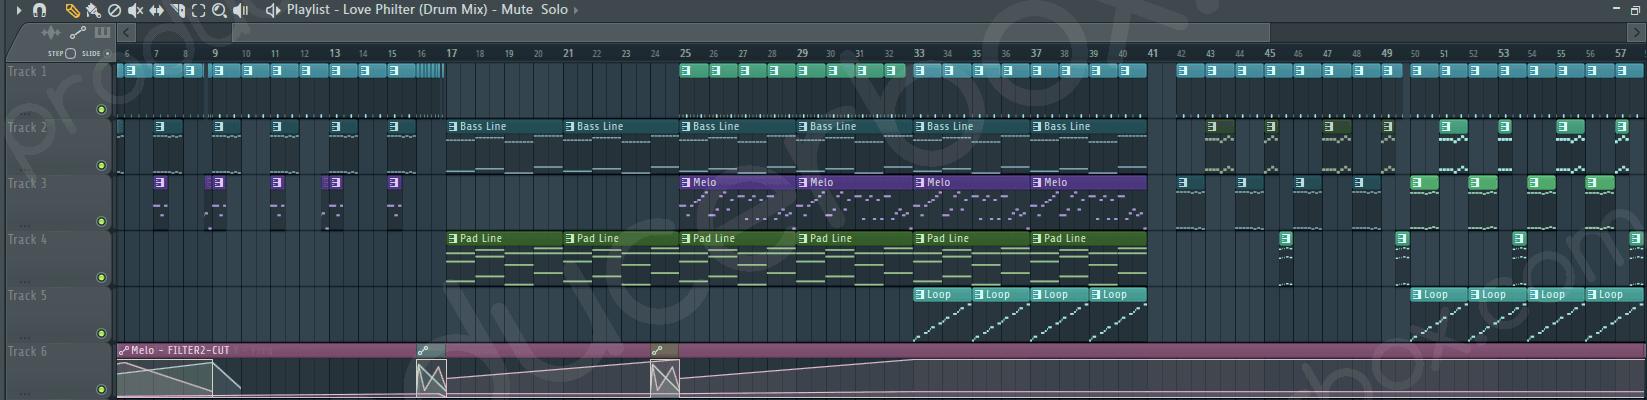 #1 Idea Work - Deep Club Screenshot